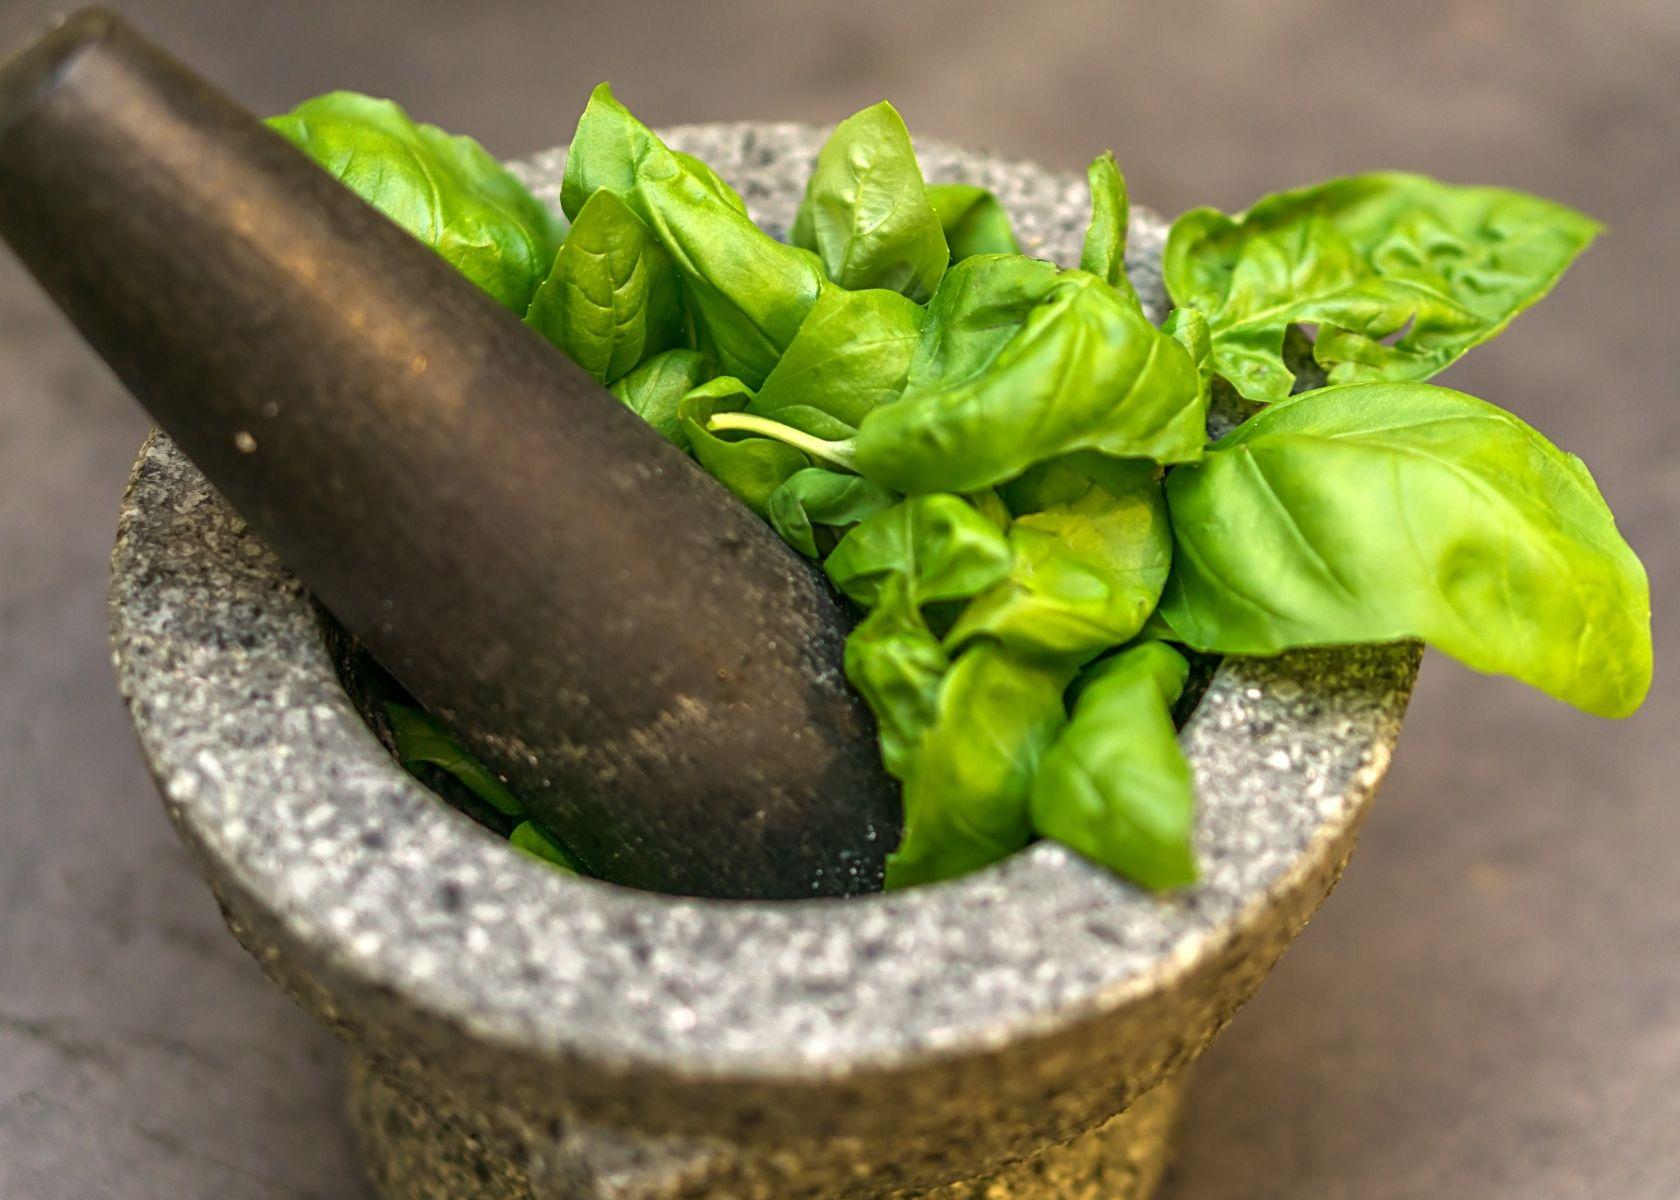 Close up fresh basil in mortar and pestle.